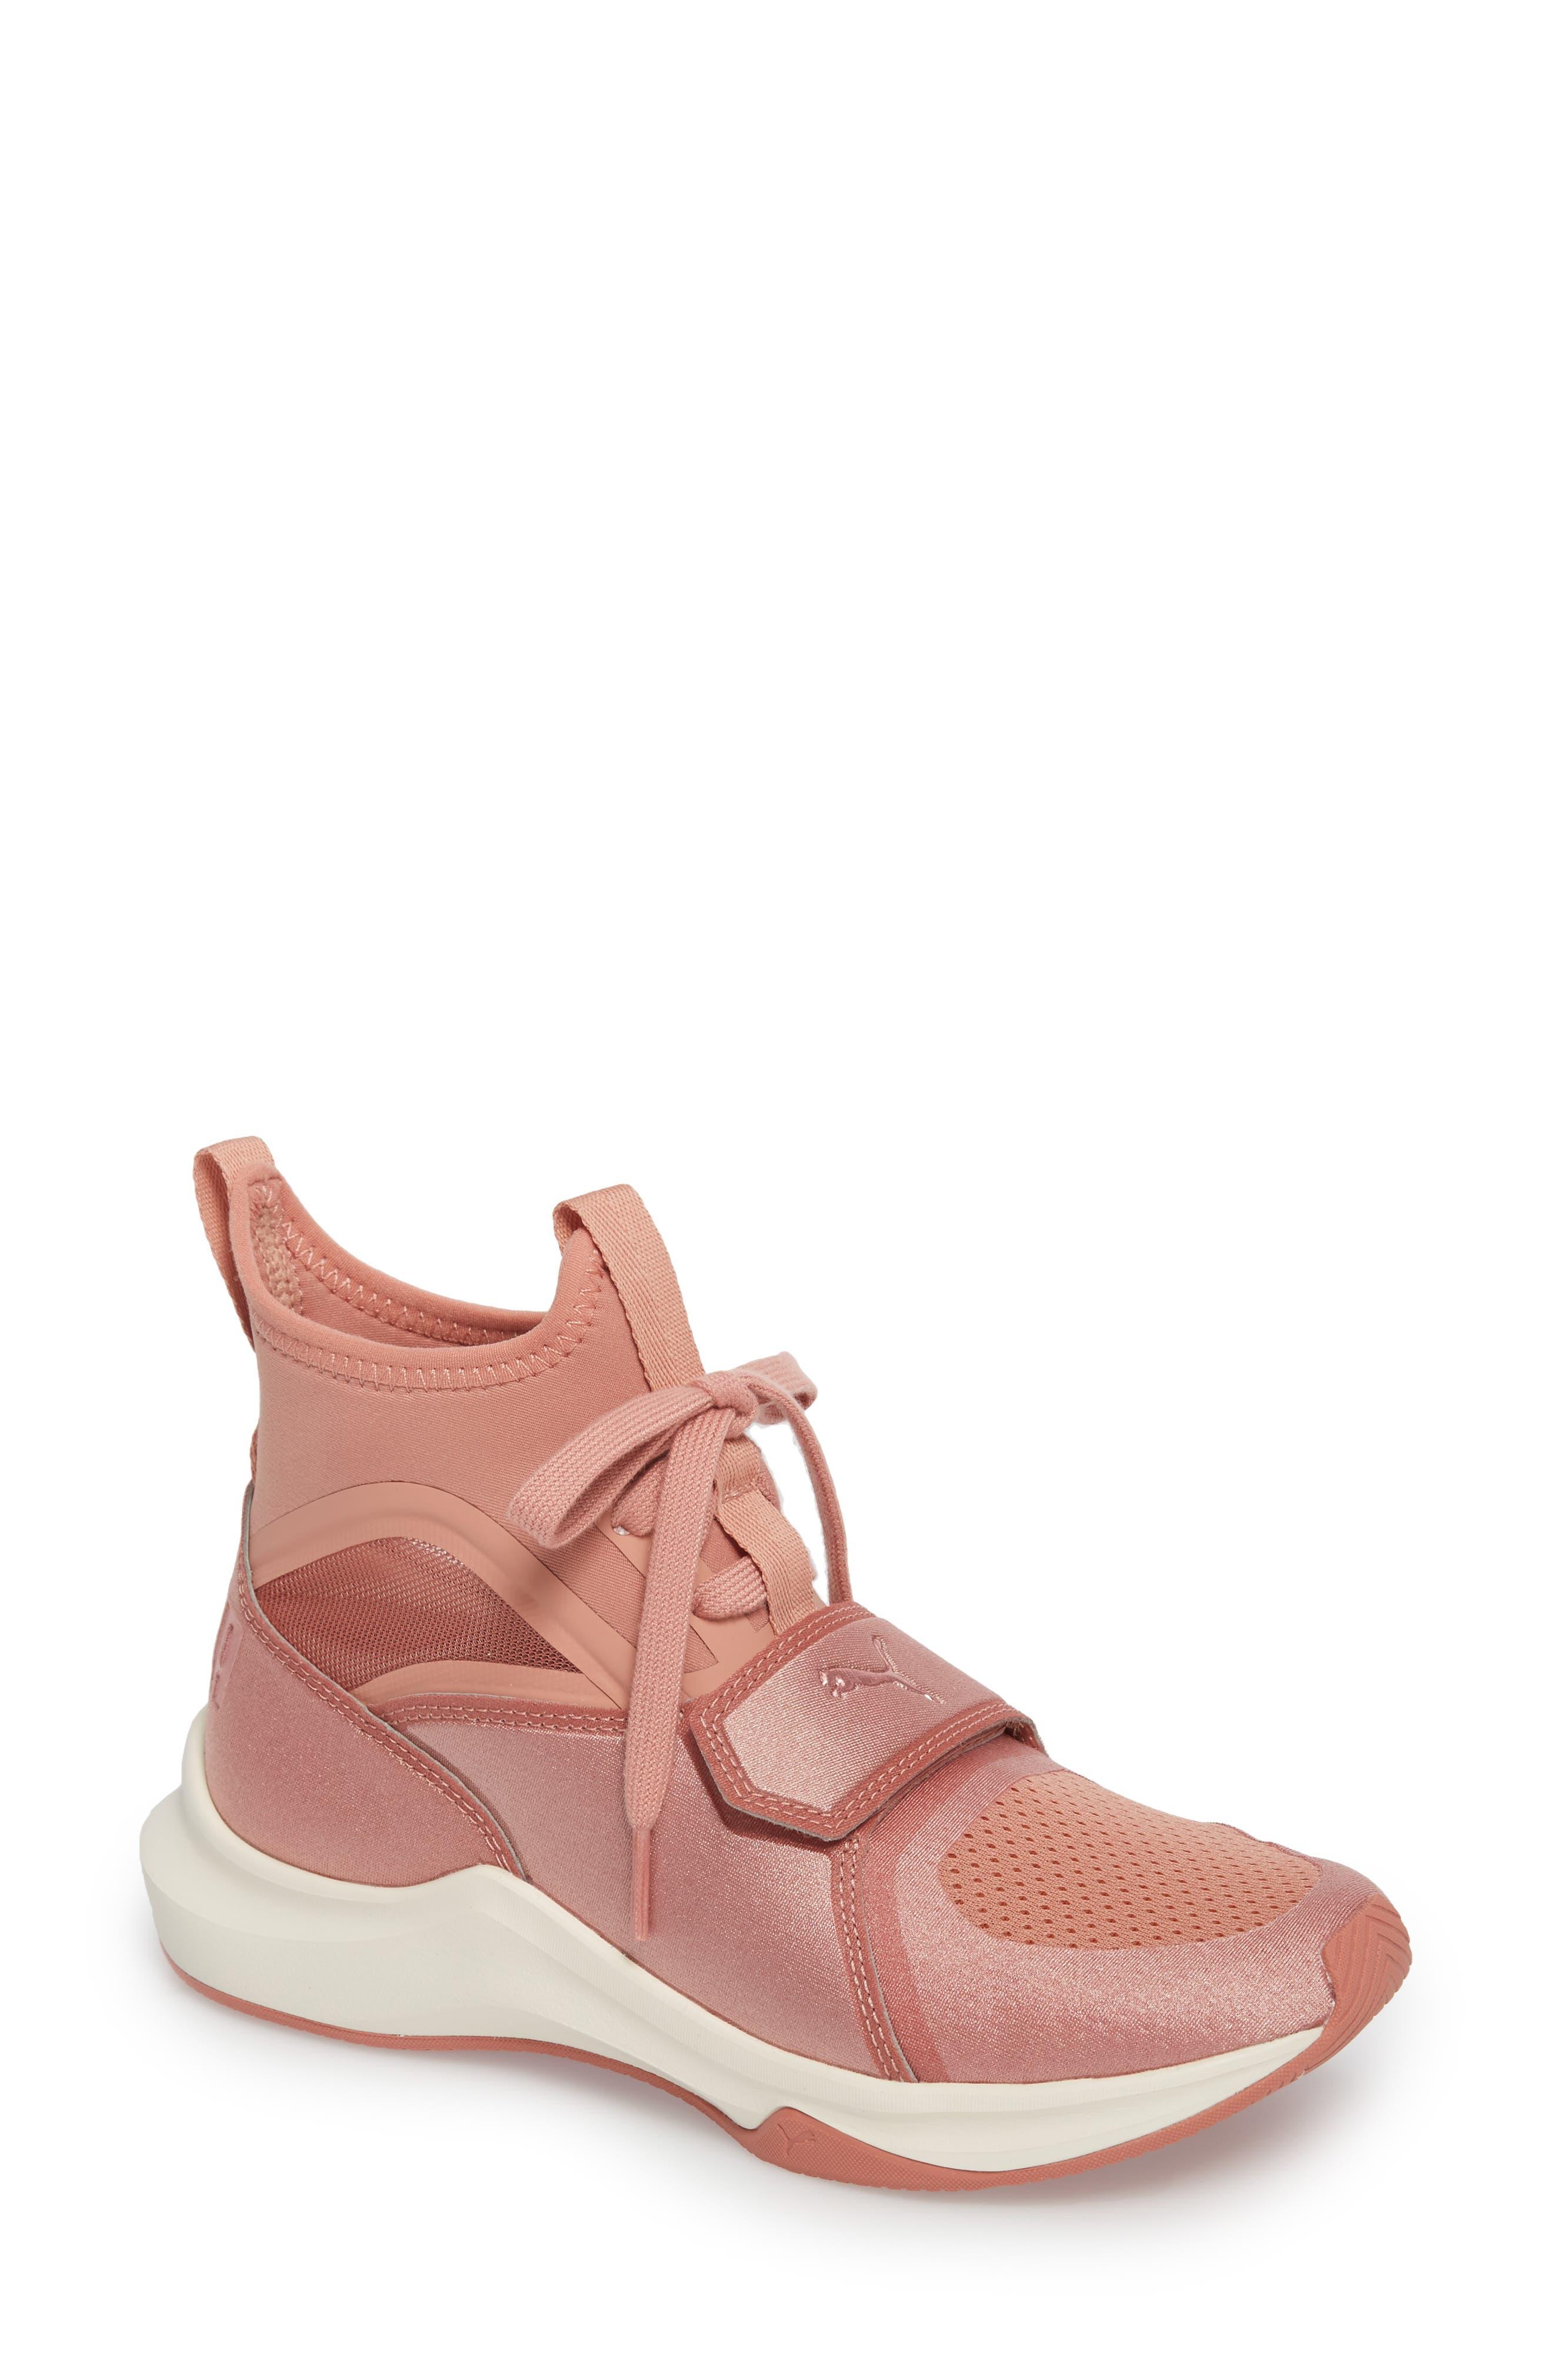 PUMA Phenom High Top Training Shoe (Women)